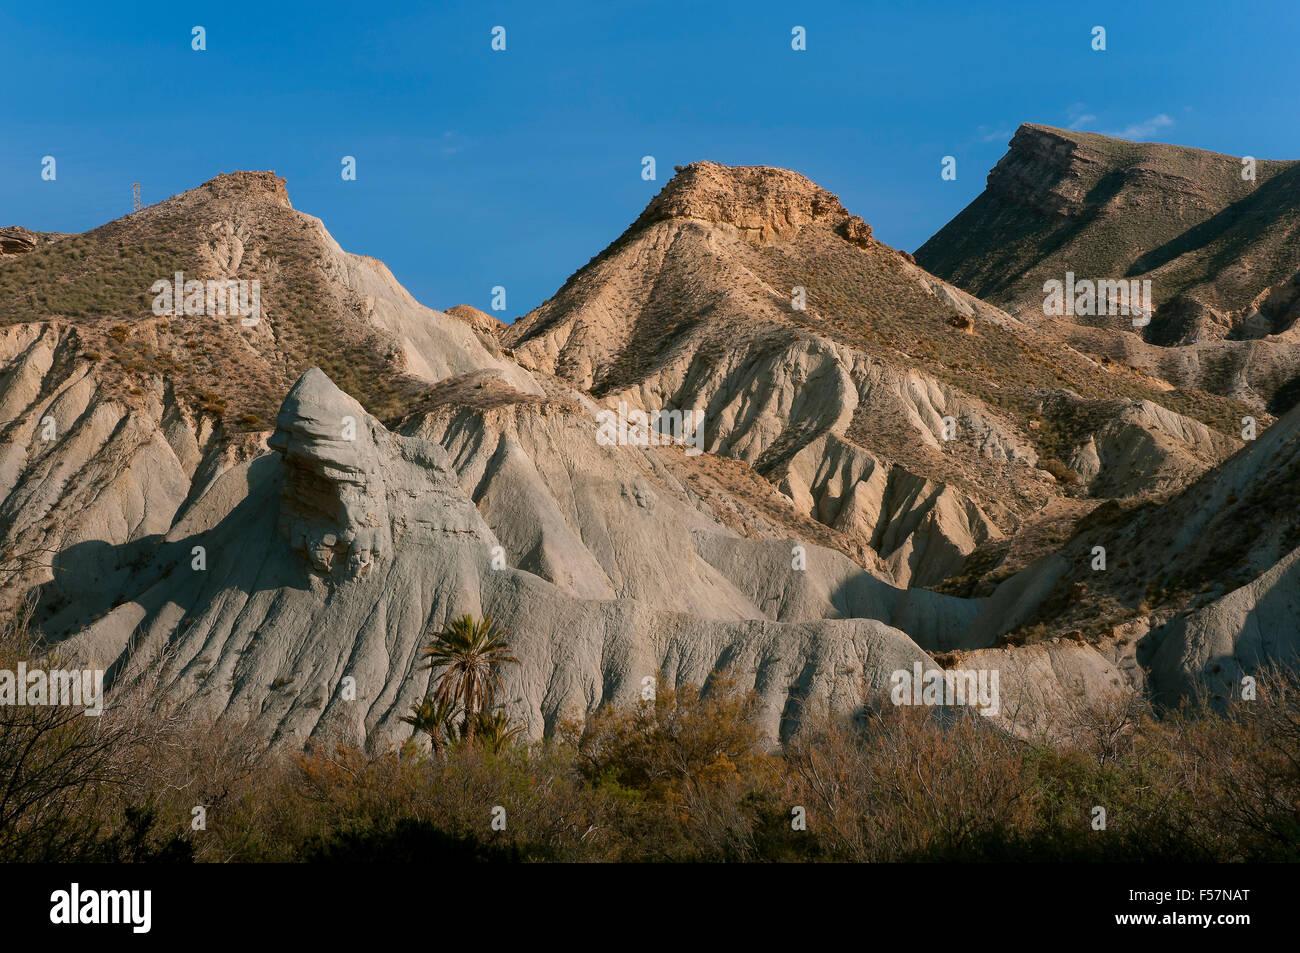 Natural Spot Tabernas Desert, Almeria province, Region of Andalusia, Spain, Europe Stock Photo